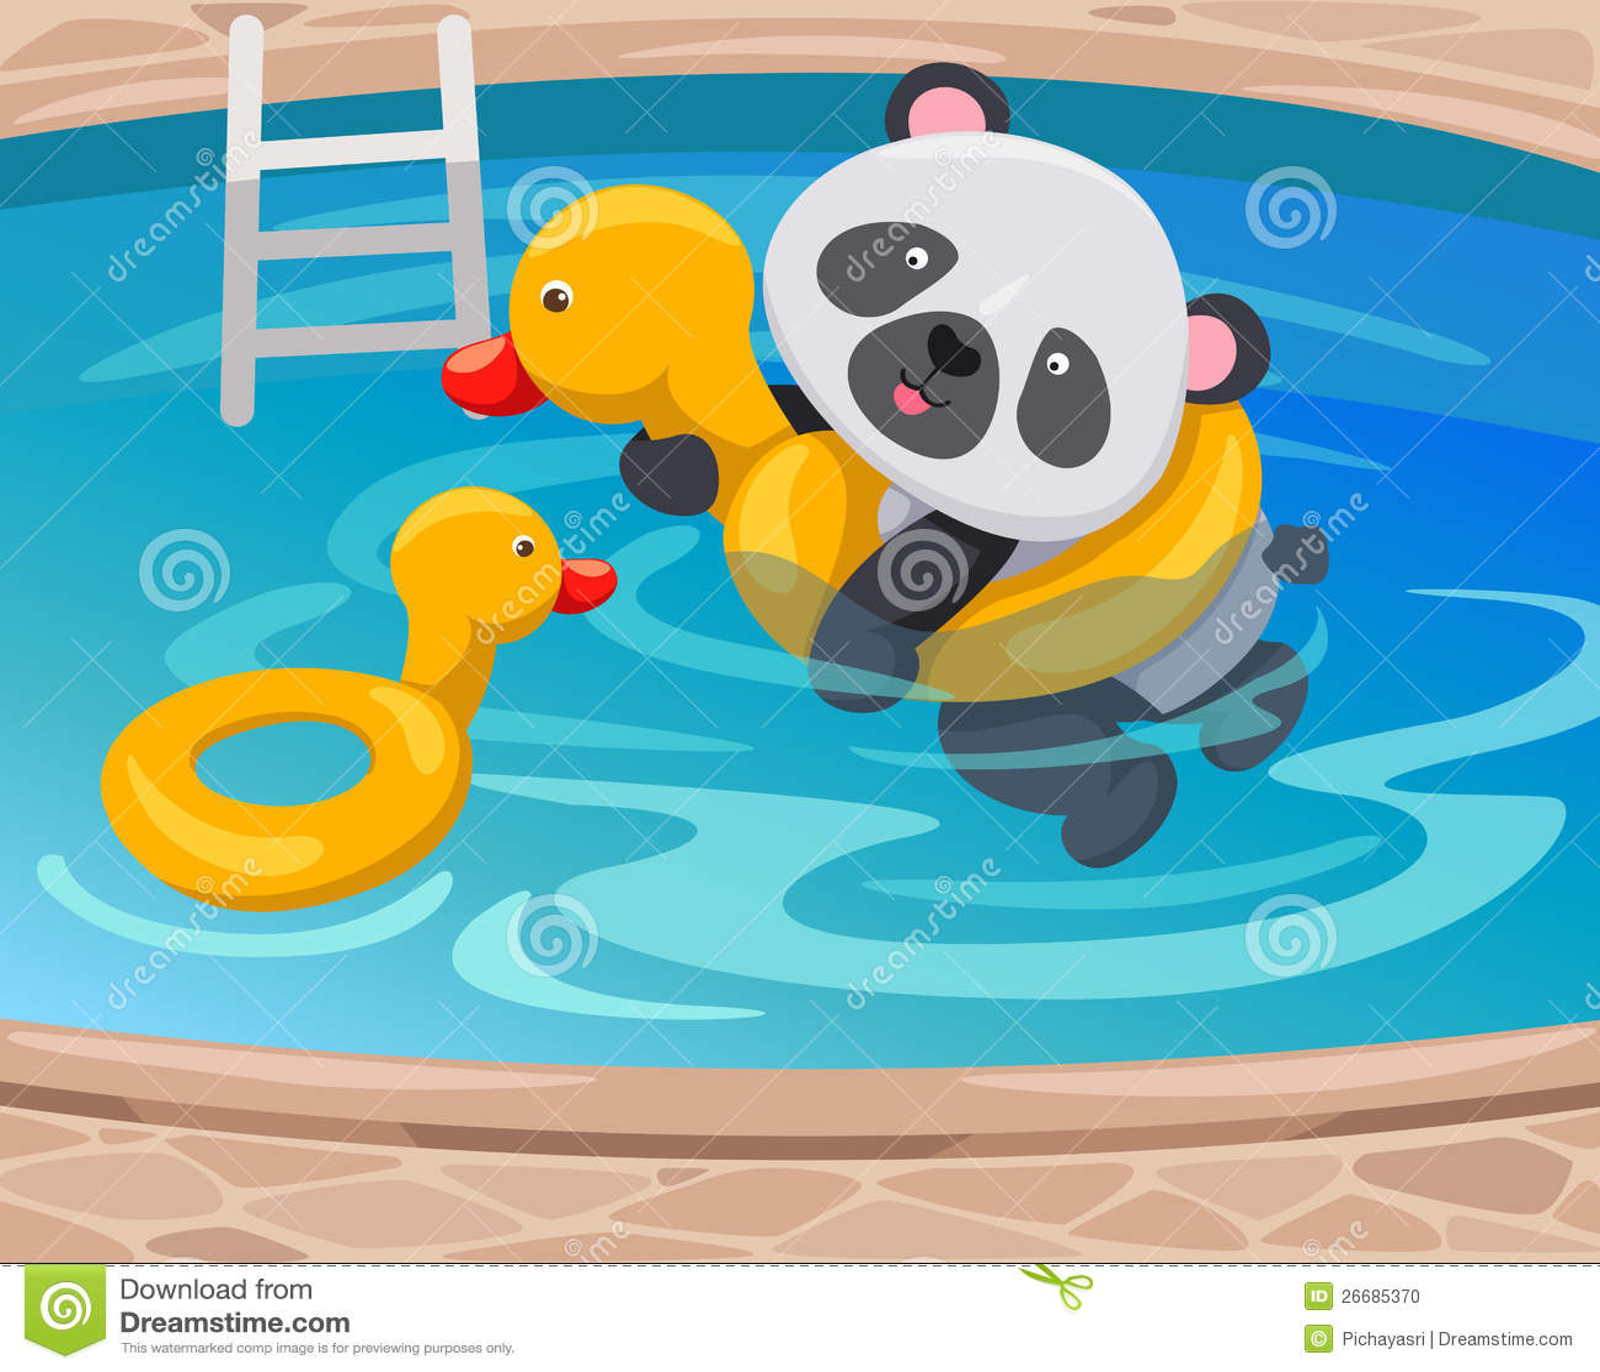 Panda Swimming With Duck Tube Stock Photo - Image: 26685370